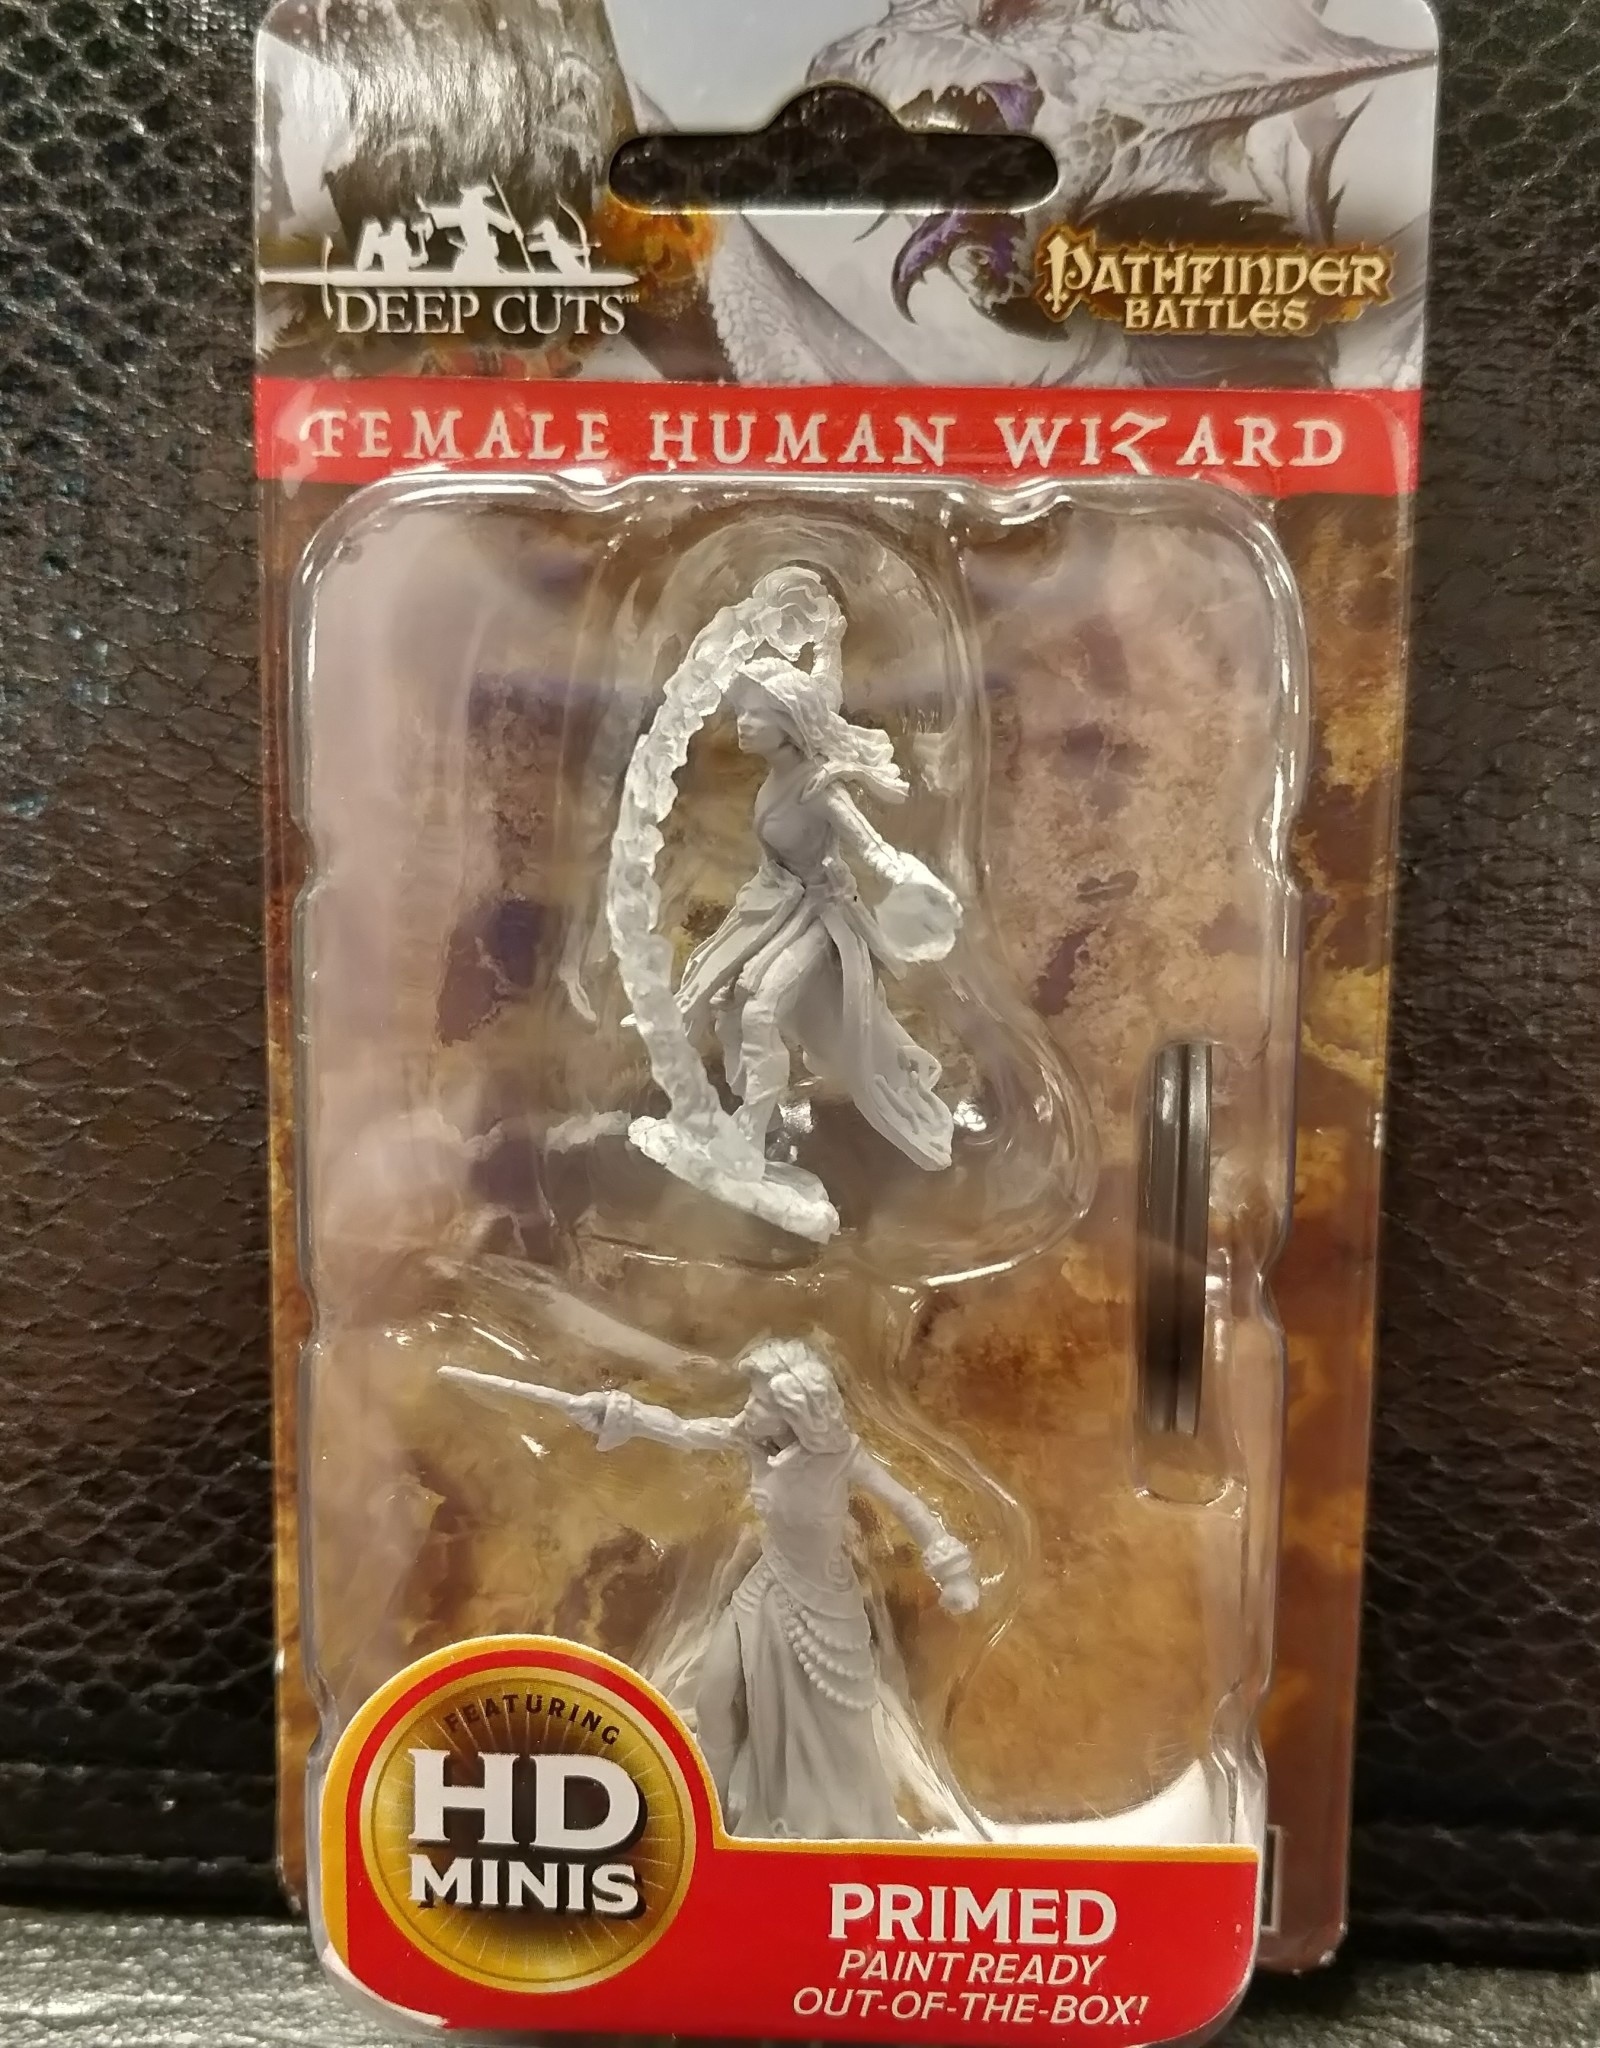 Pathfinder Deep Cuts Unpainted Miniatures: W6 Female Human Wizard